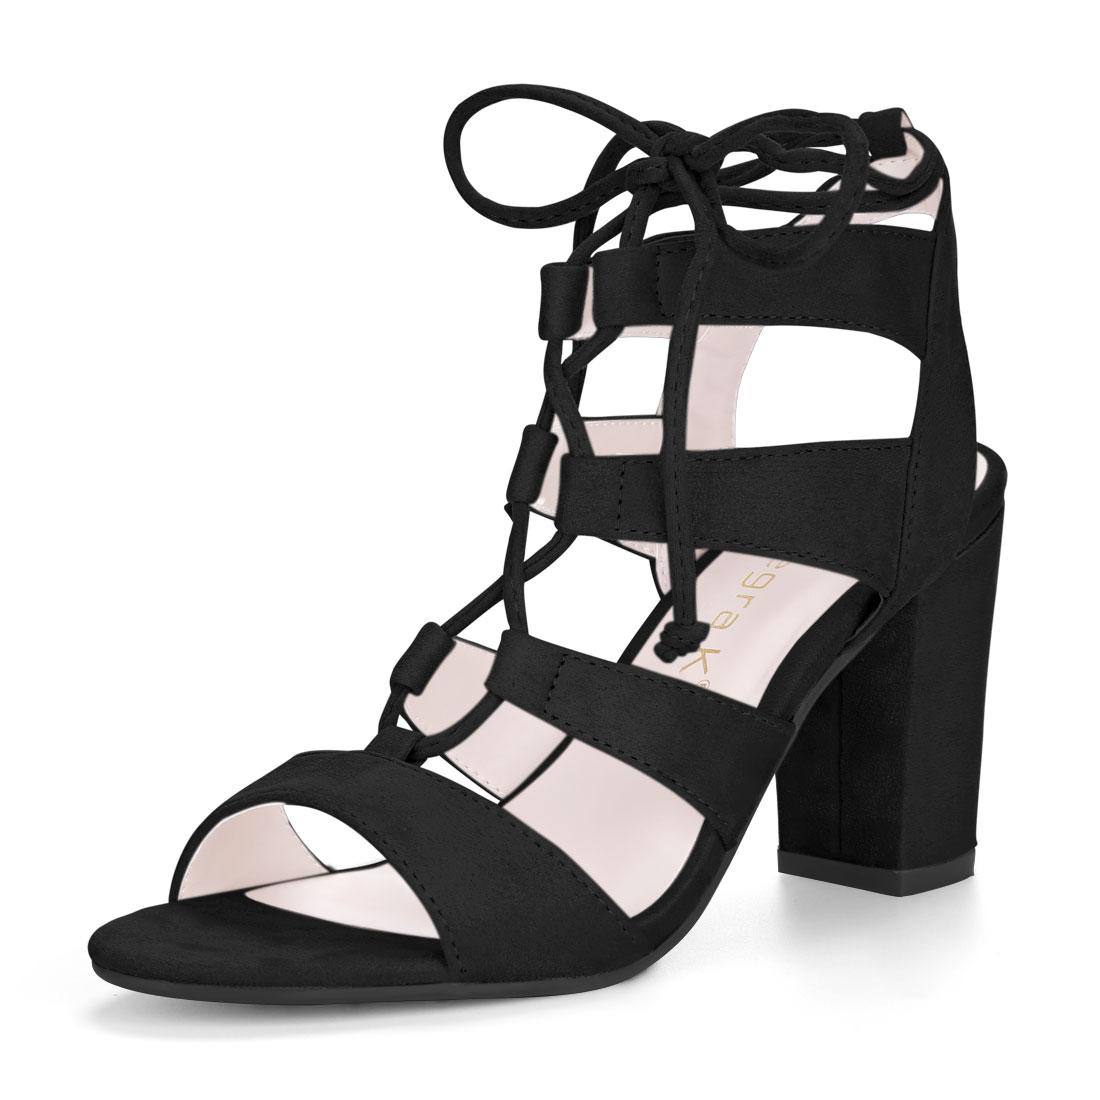 Allegra K Women's Tie Up Strappy Gladiator Block Heel Sandals Black US 7.5